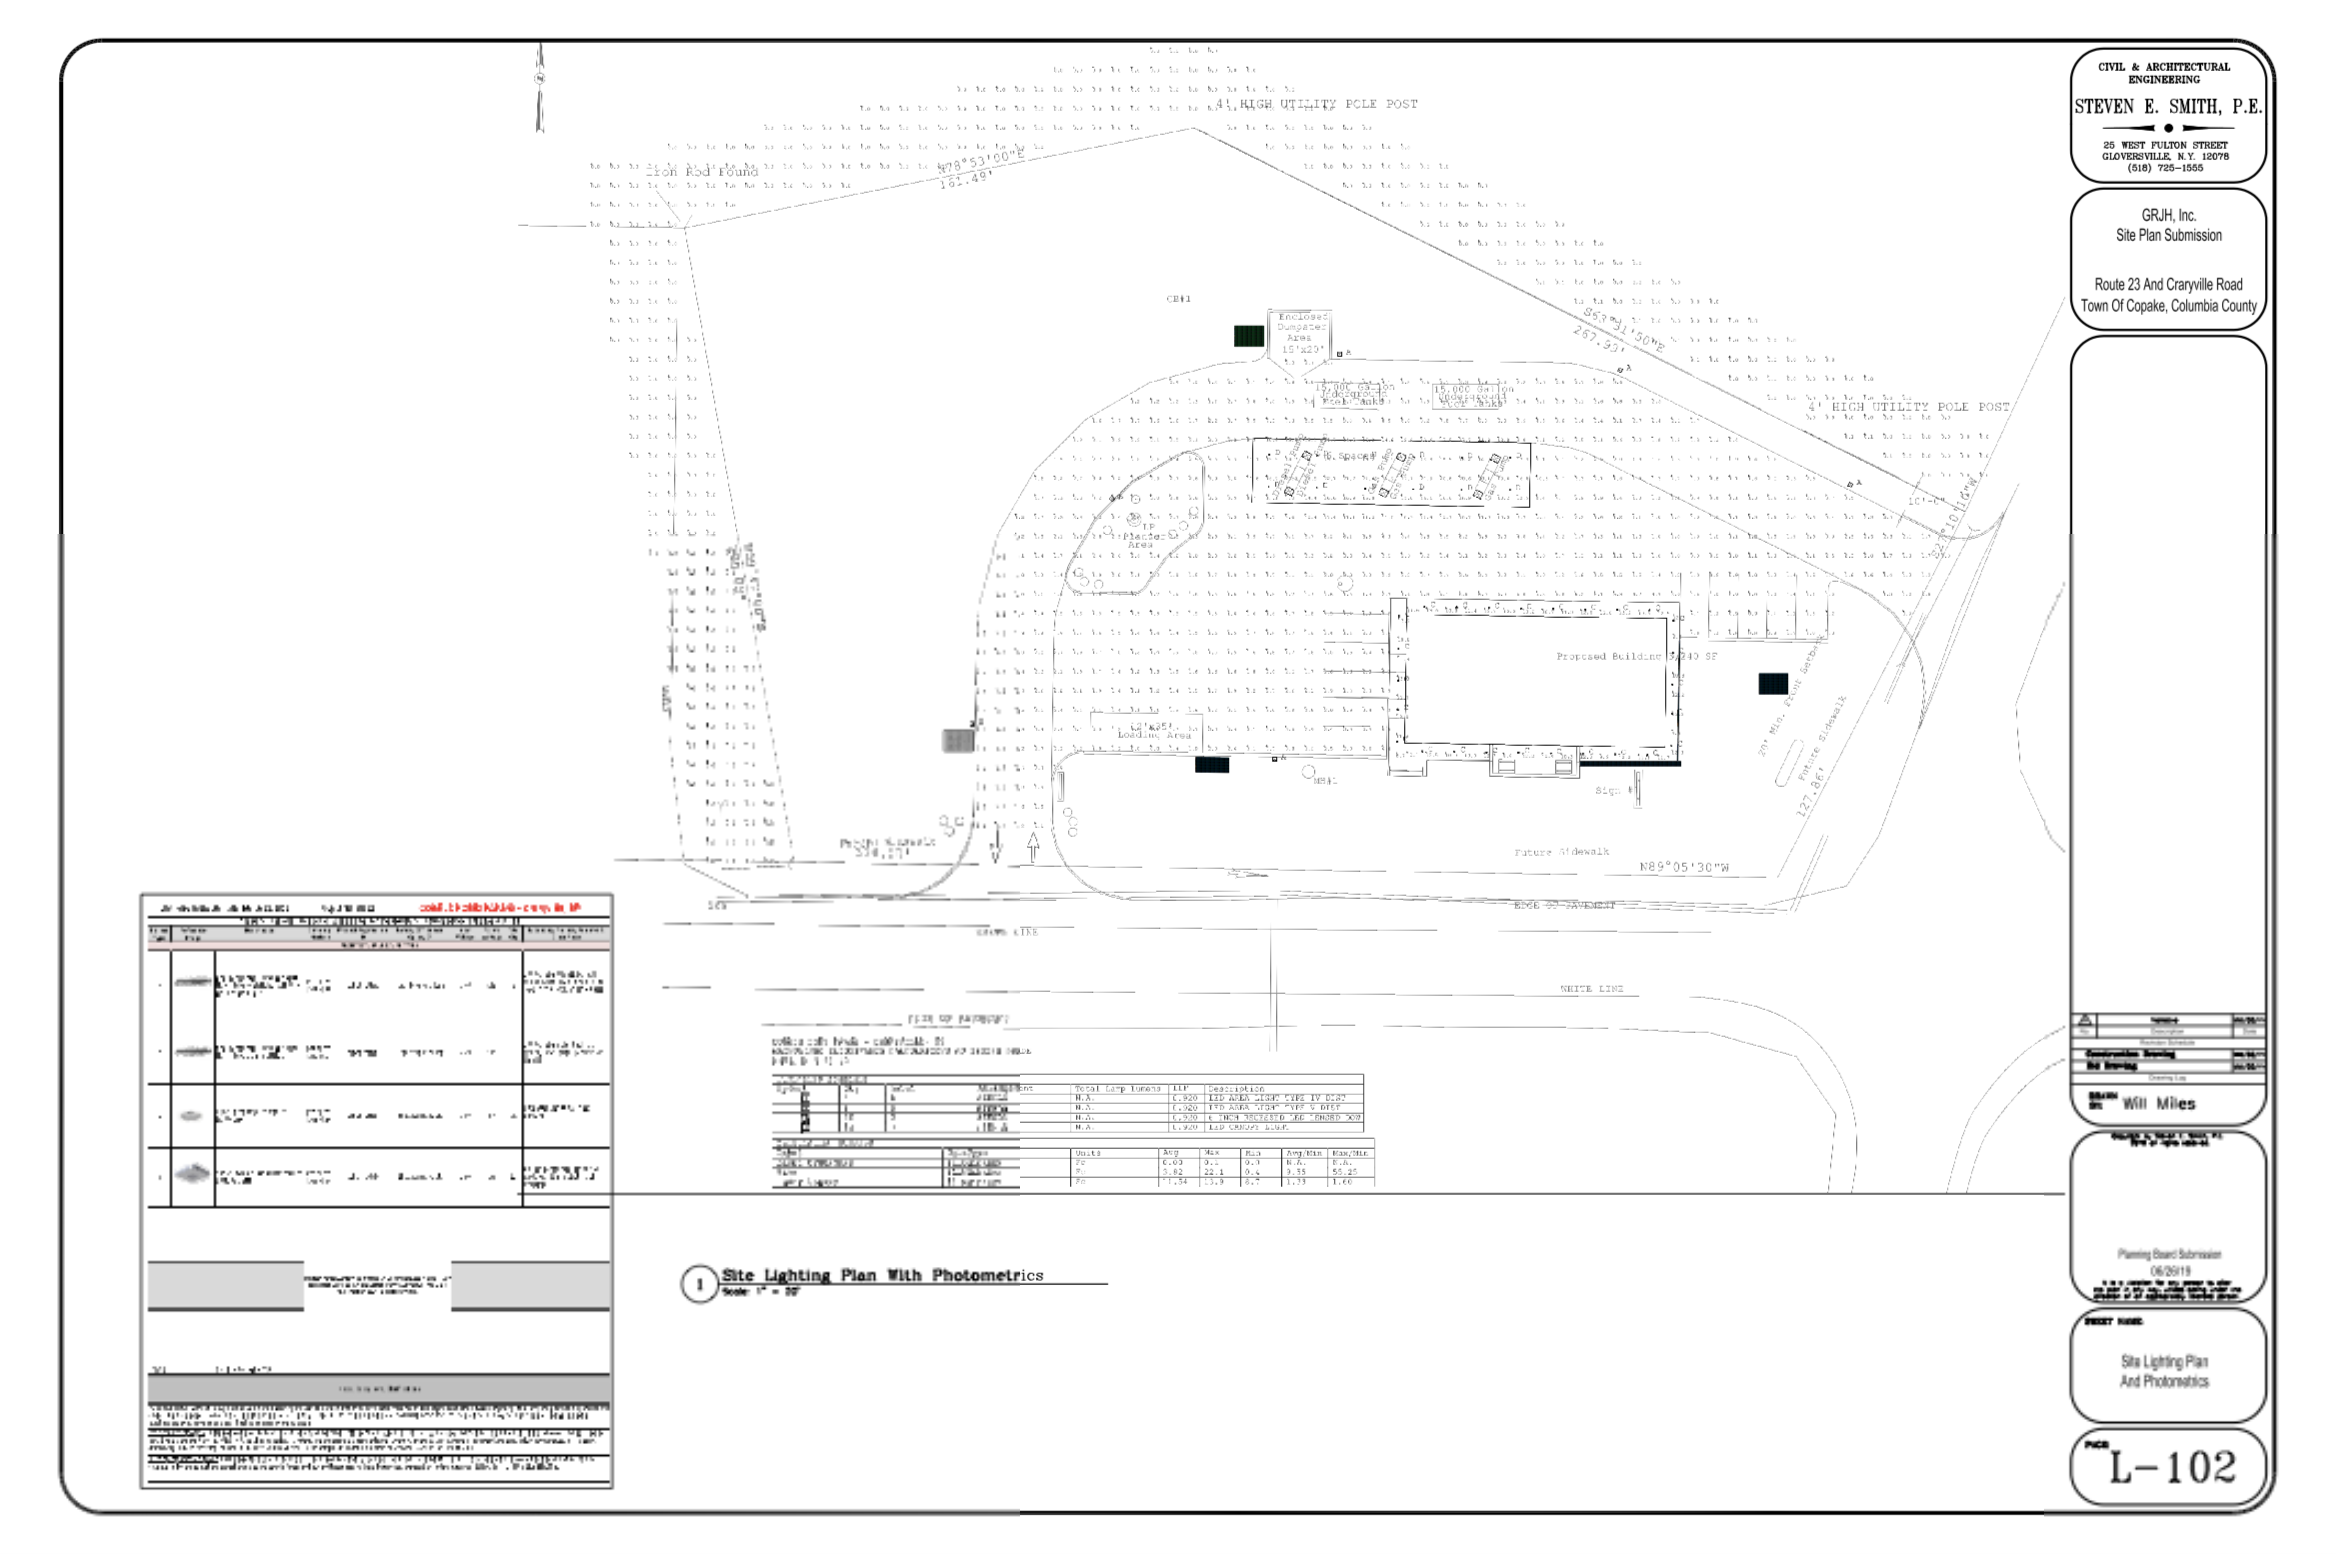 Site Plans GRJH Cobble Pond Gas Station_14.jpg